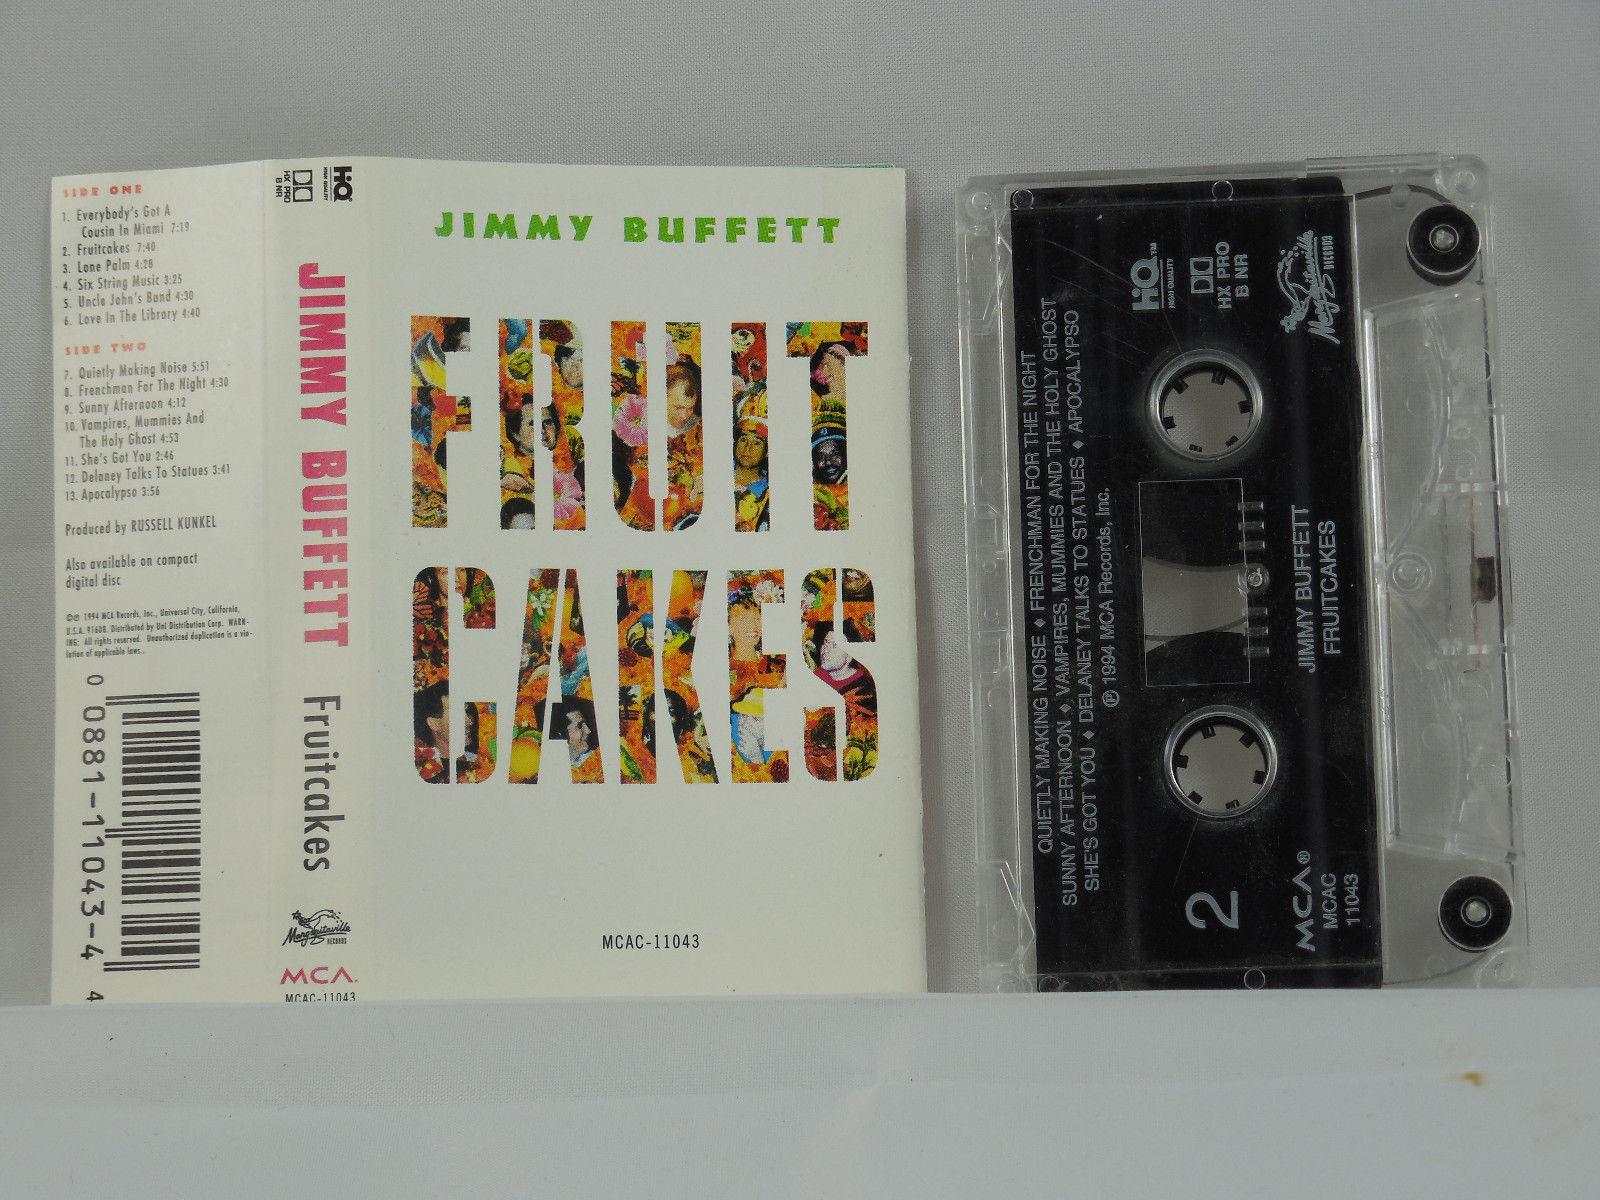 JIMMY BUFFETT FRUITCAKES CASSETTE 1982 image 3